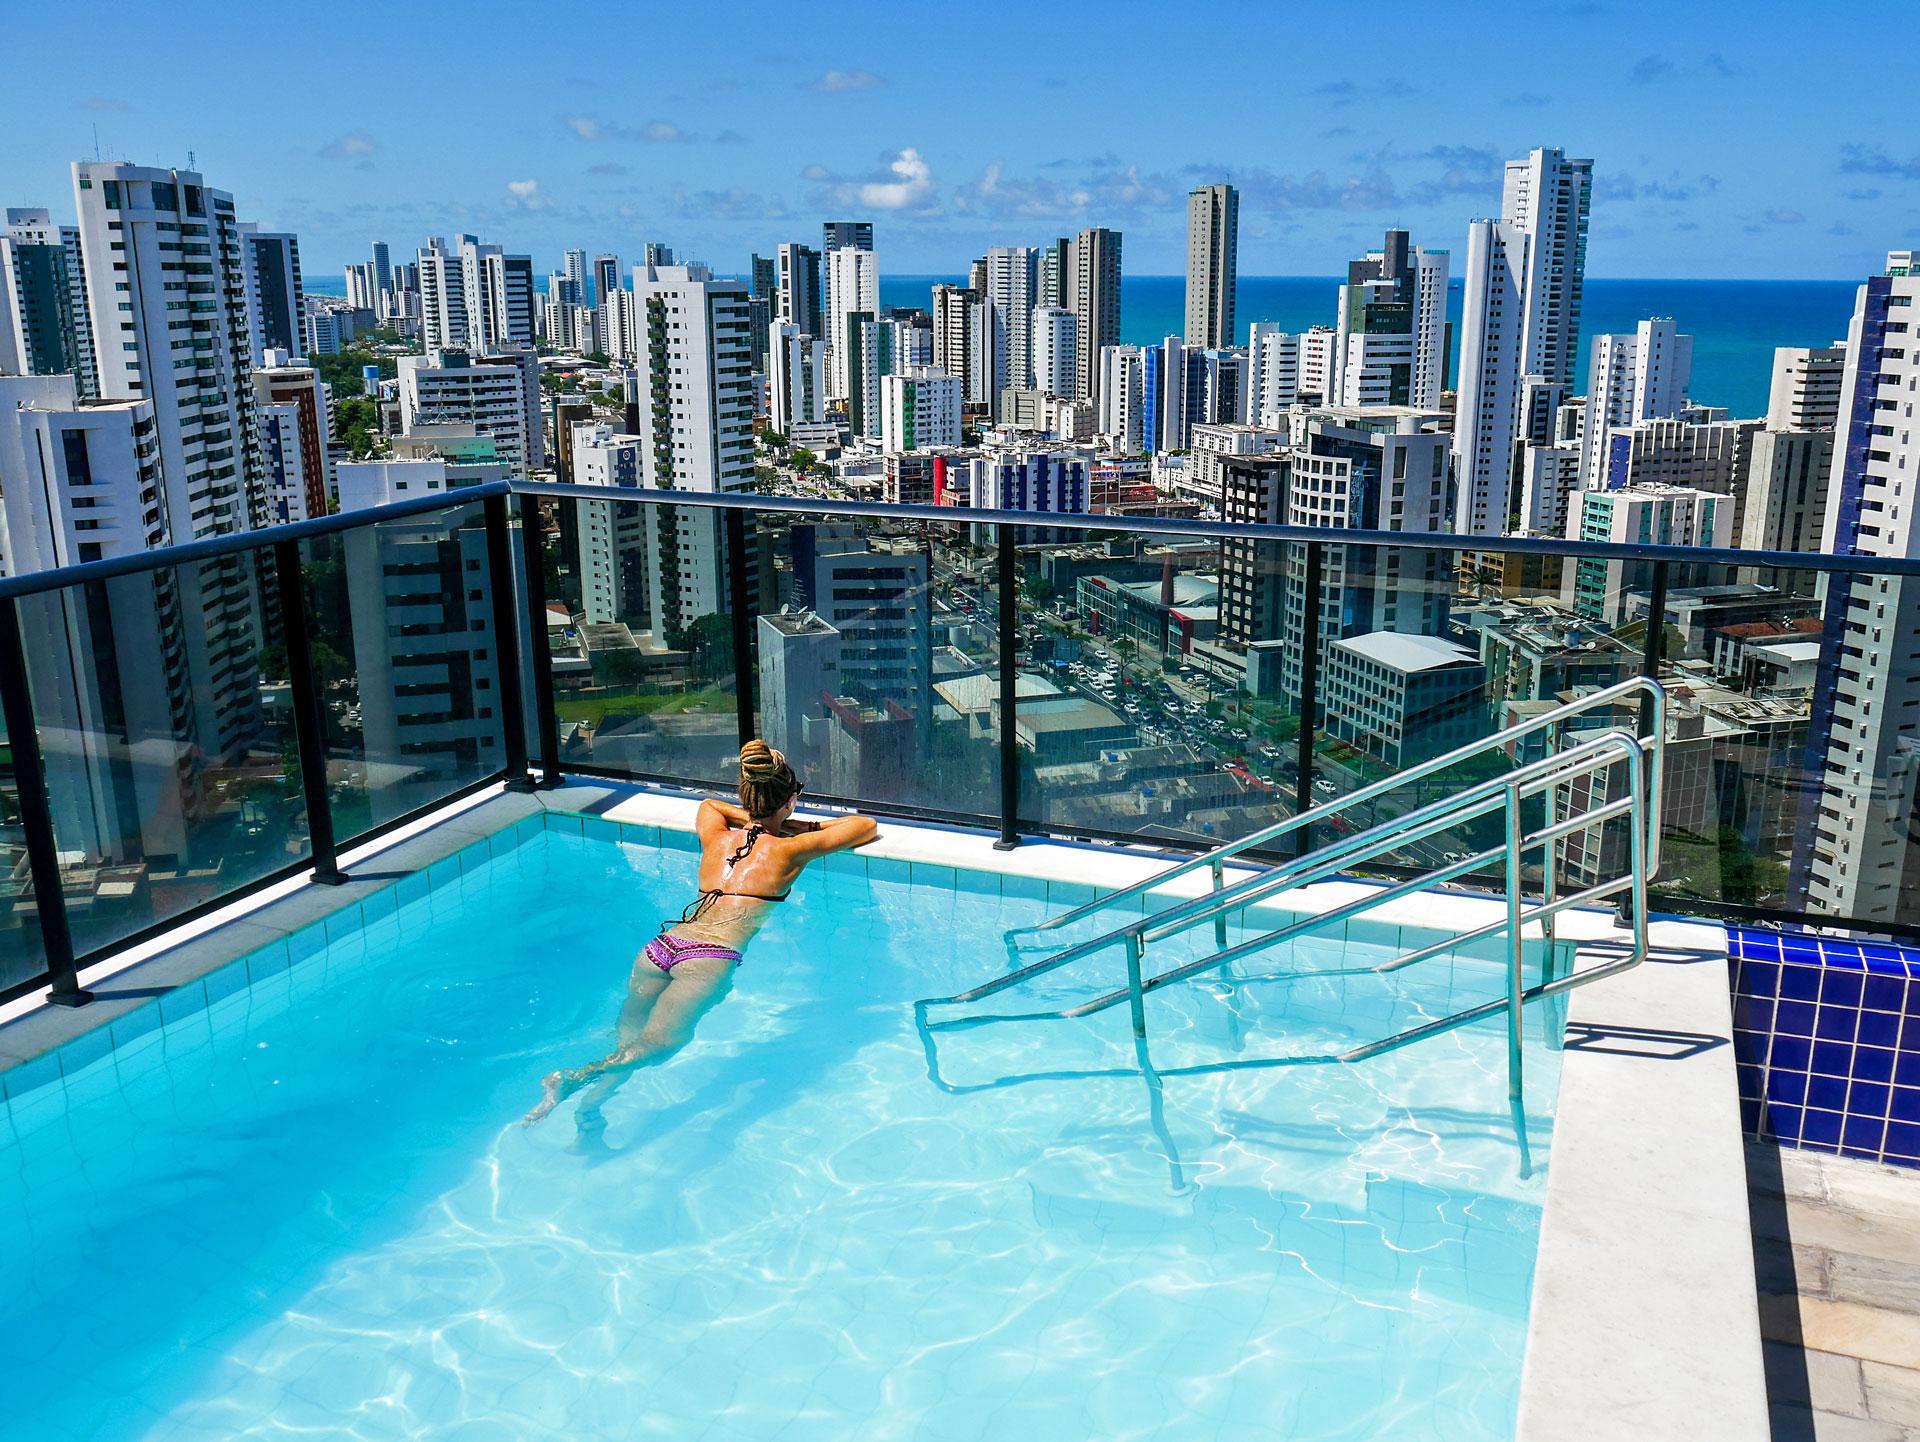 Rasta girl in rooftop pool overlooking Boa Viagem in Recife, Brazil